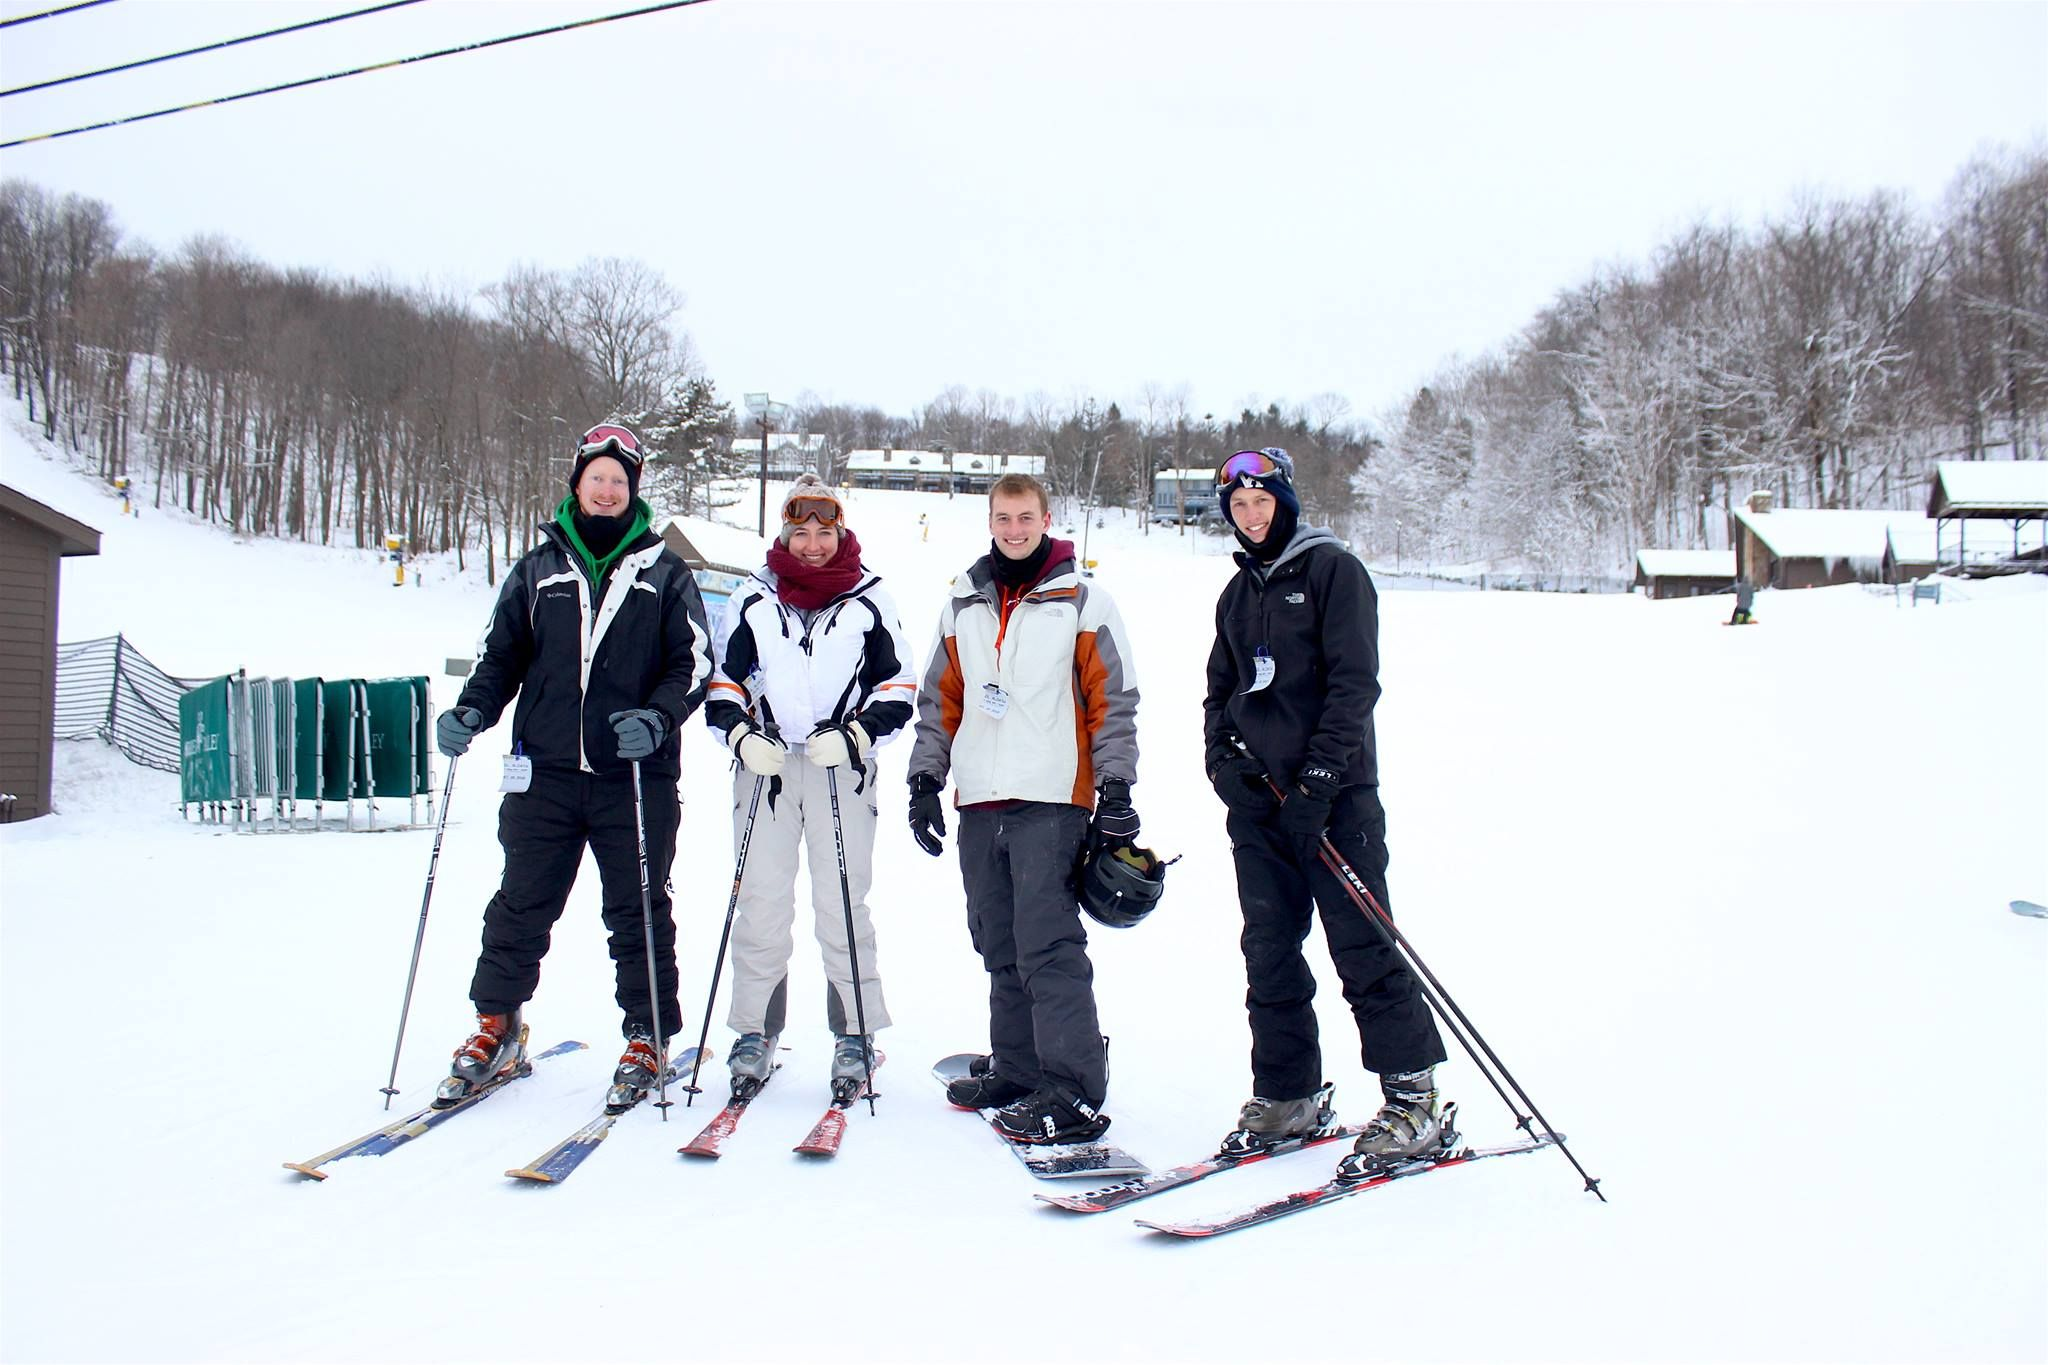 Golf Snow Sports Skiing Snowboarding Skiing